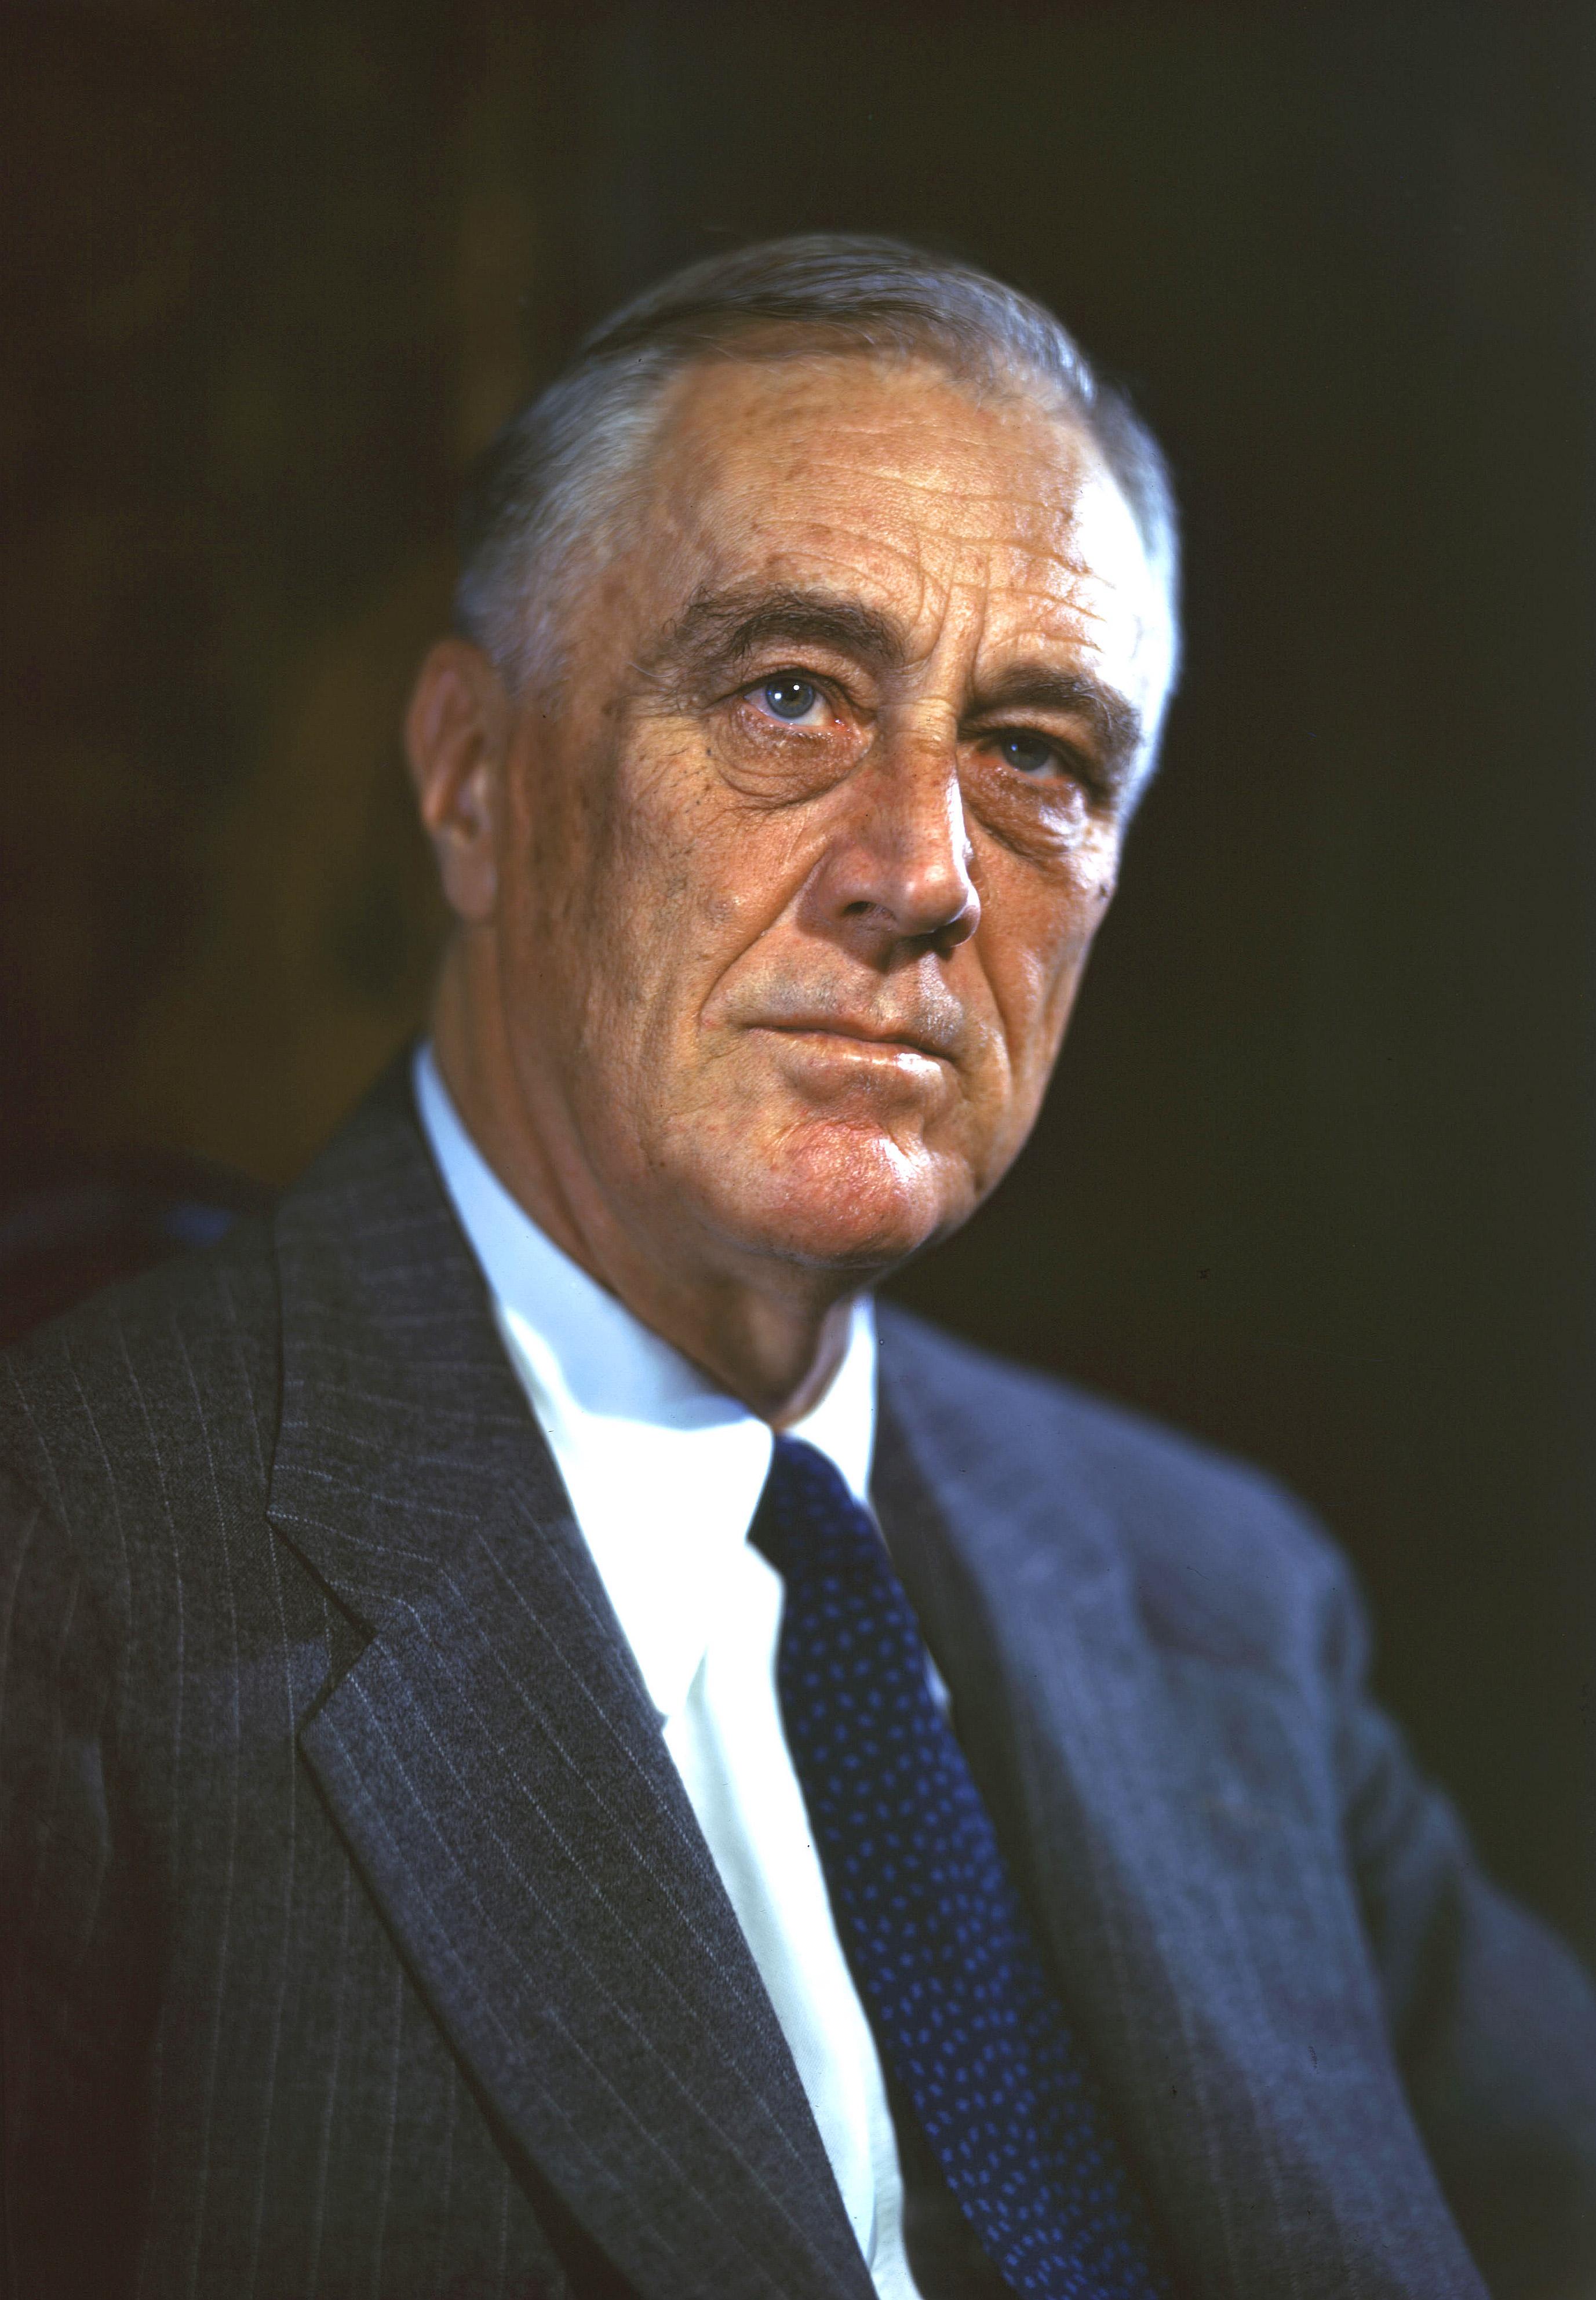 [Roosevelt]